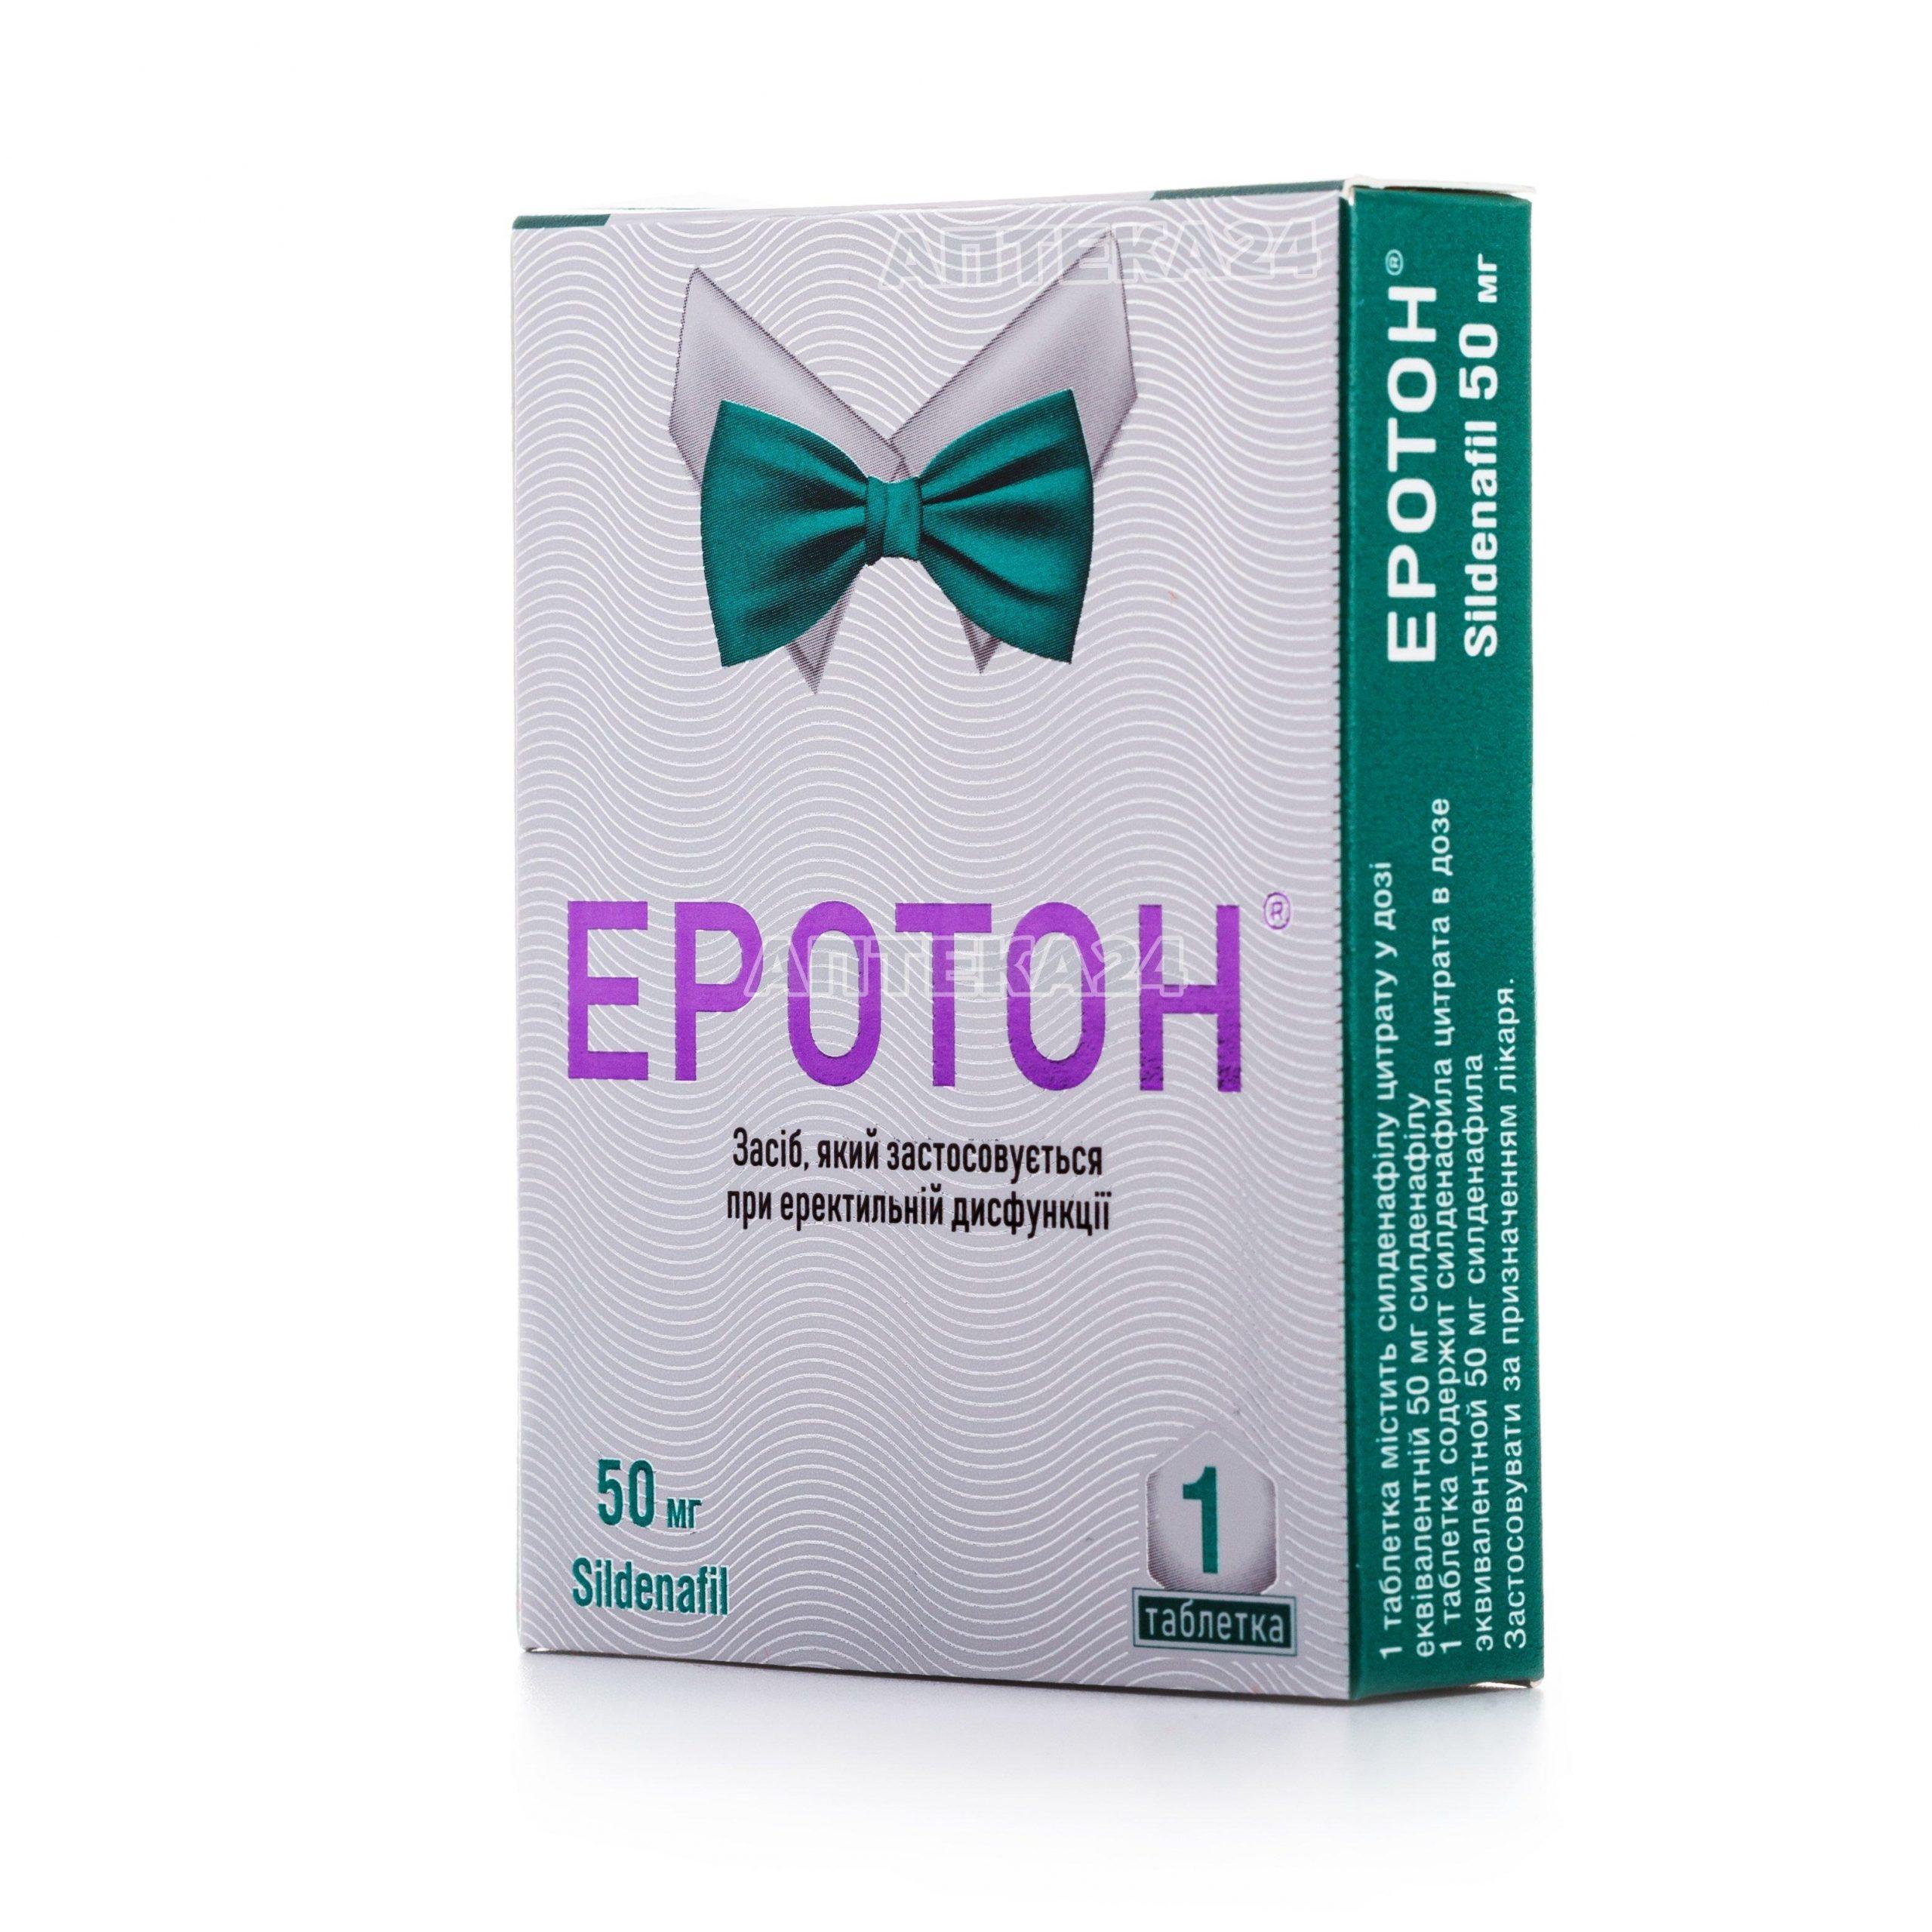 Эротон 50 мг N1 таблетки_600fd251c040a.jpeg